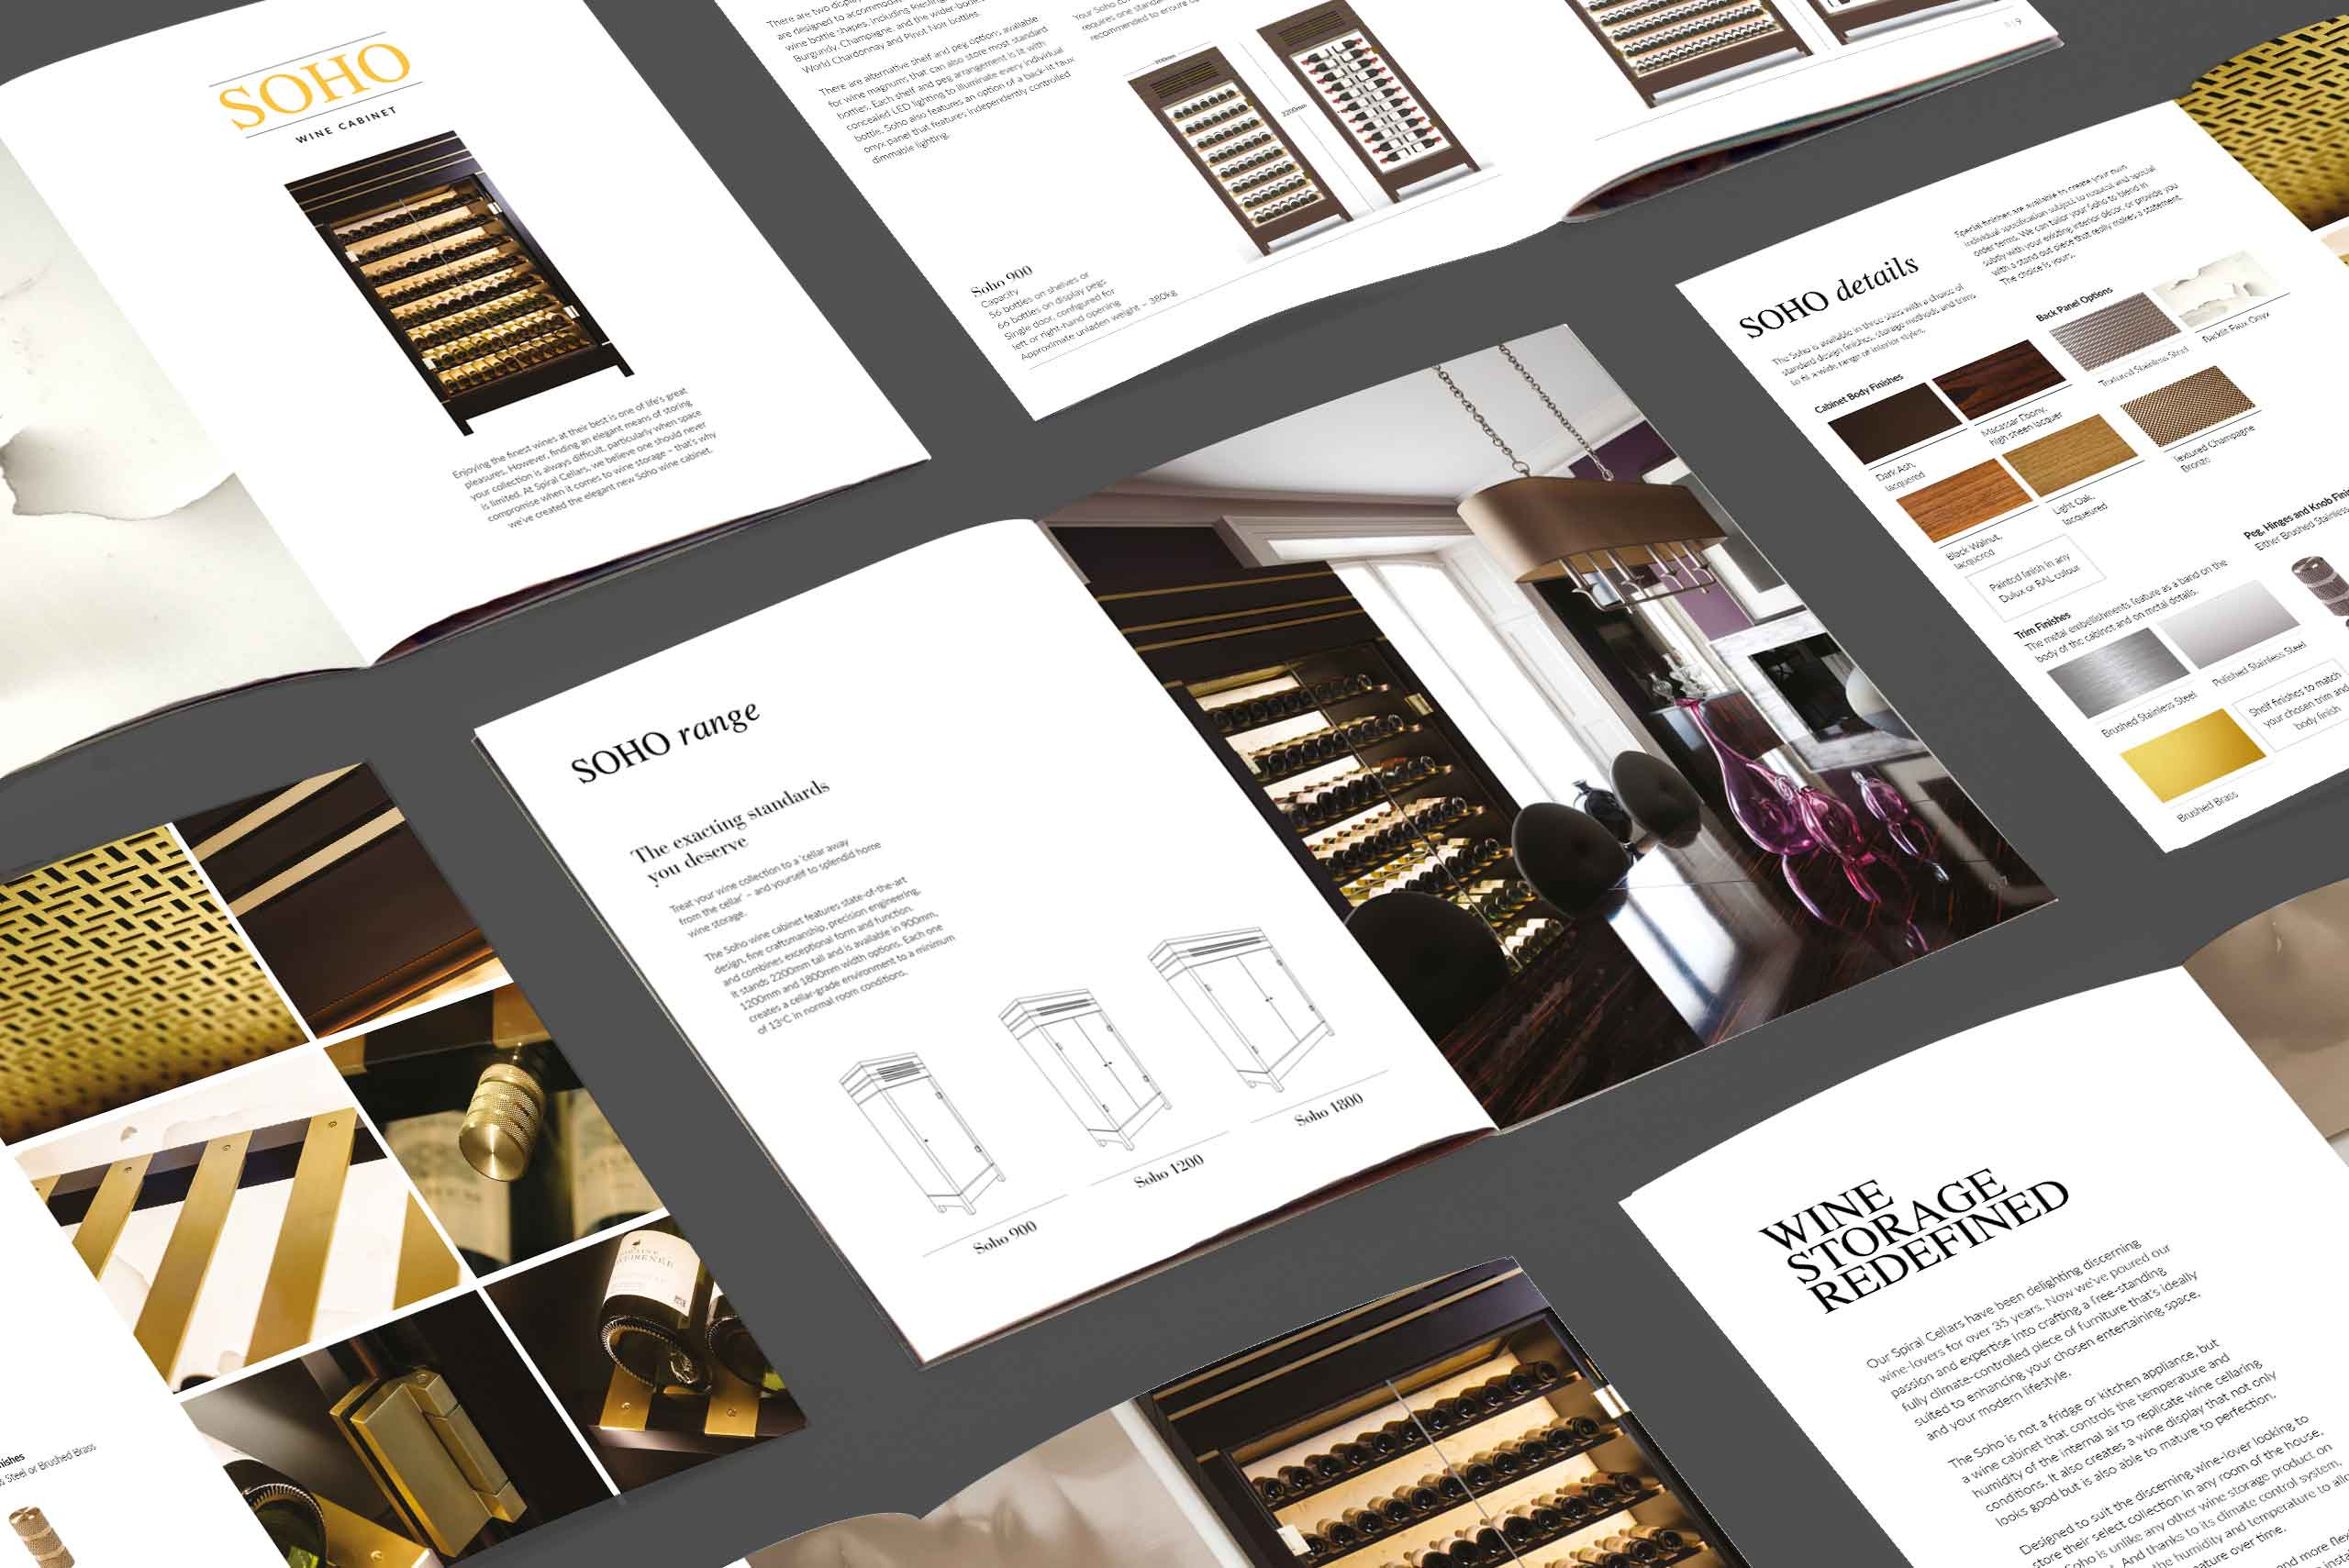 Luxury interior product marketing Spiral Cellars multi-page